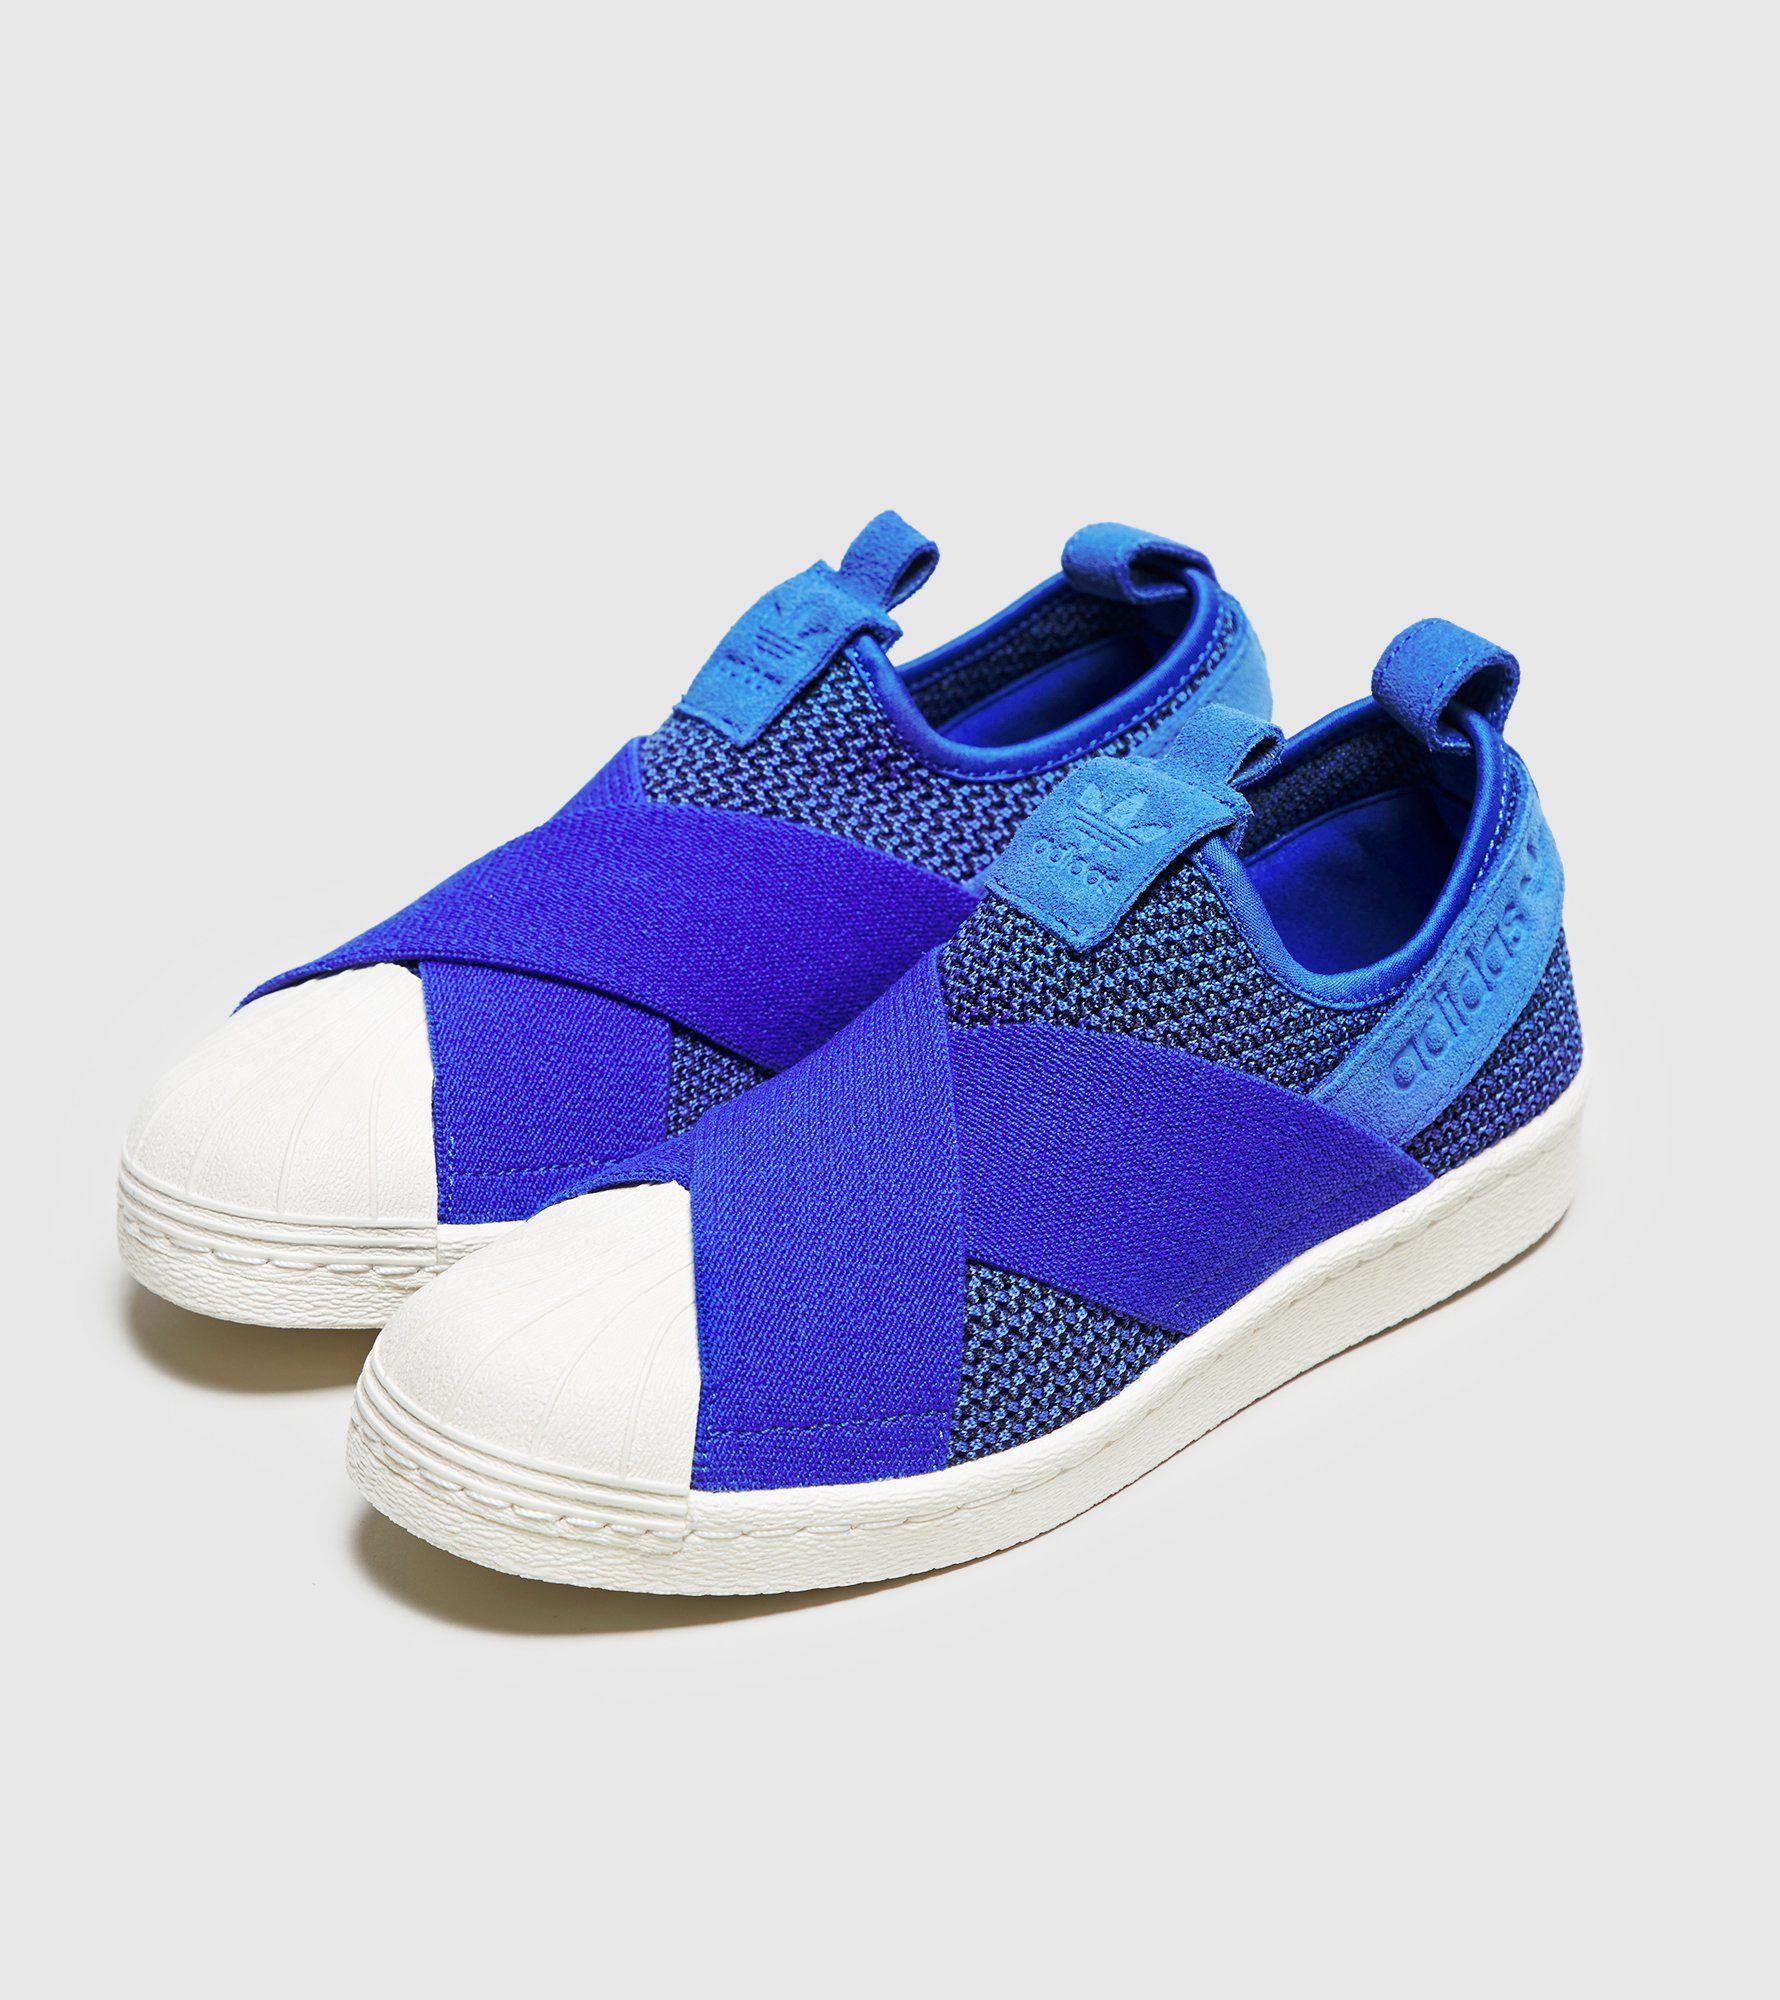 Adidas Superstar Slip On Aqua